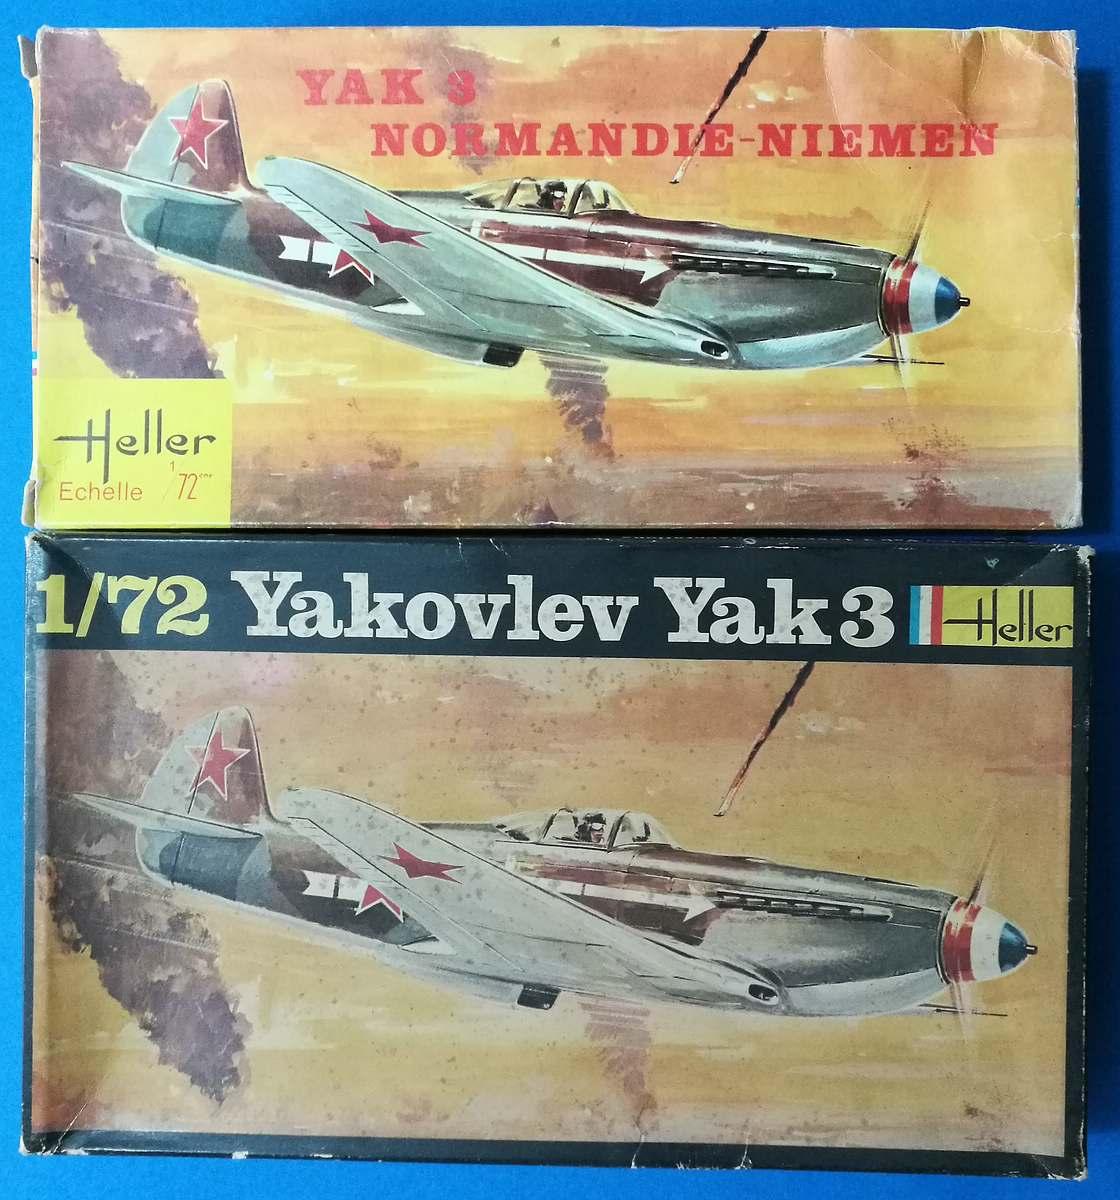 HELLER-L-090-Yak-3-Normandie-Niemen-4 Kit-Archäologie: Yak-3 Normandie-Niemen in 1:72 von HELLER # L 060